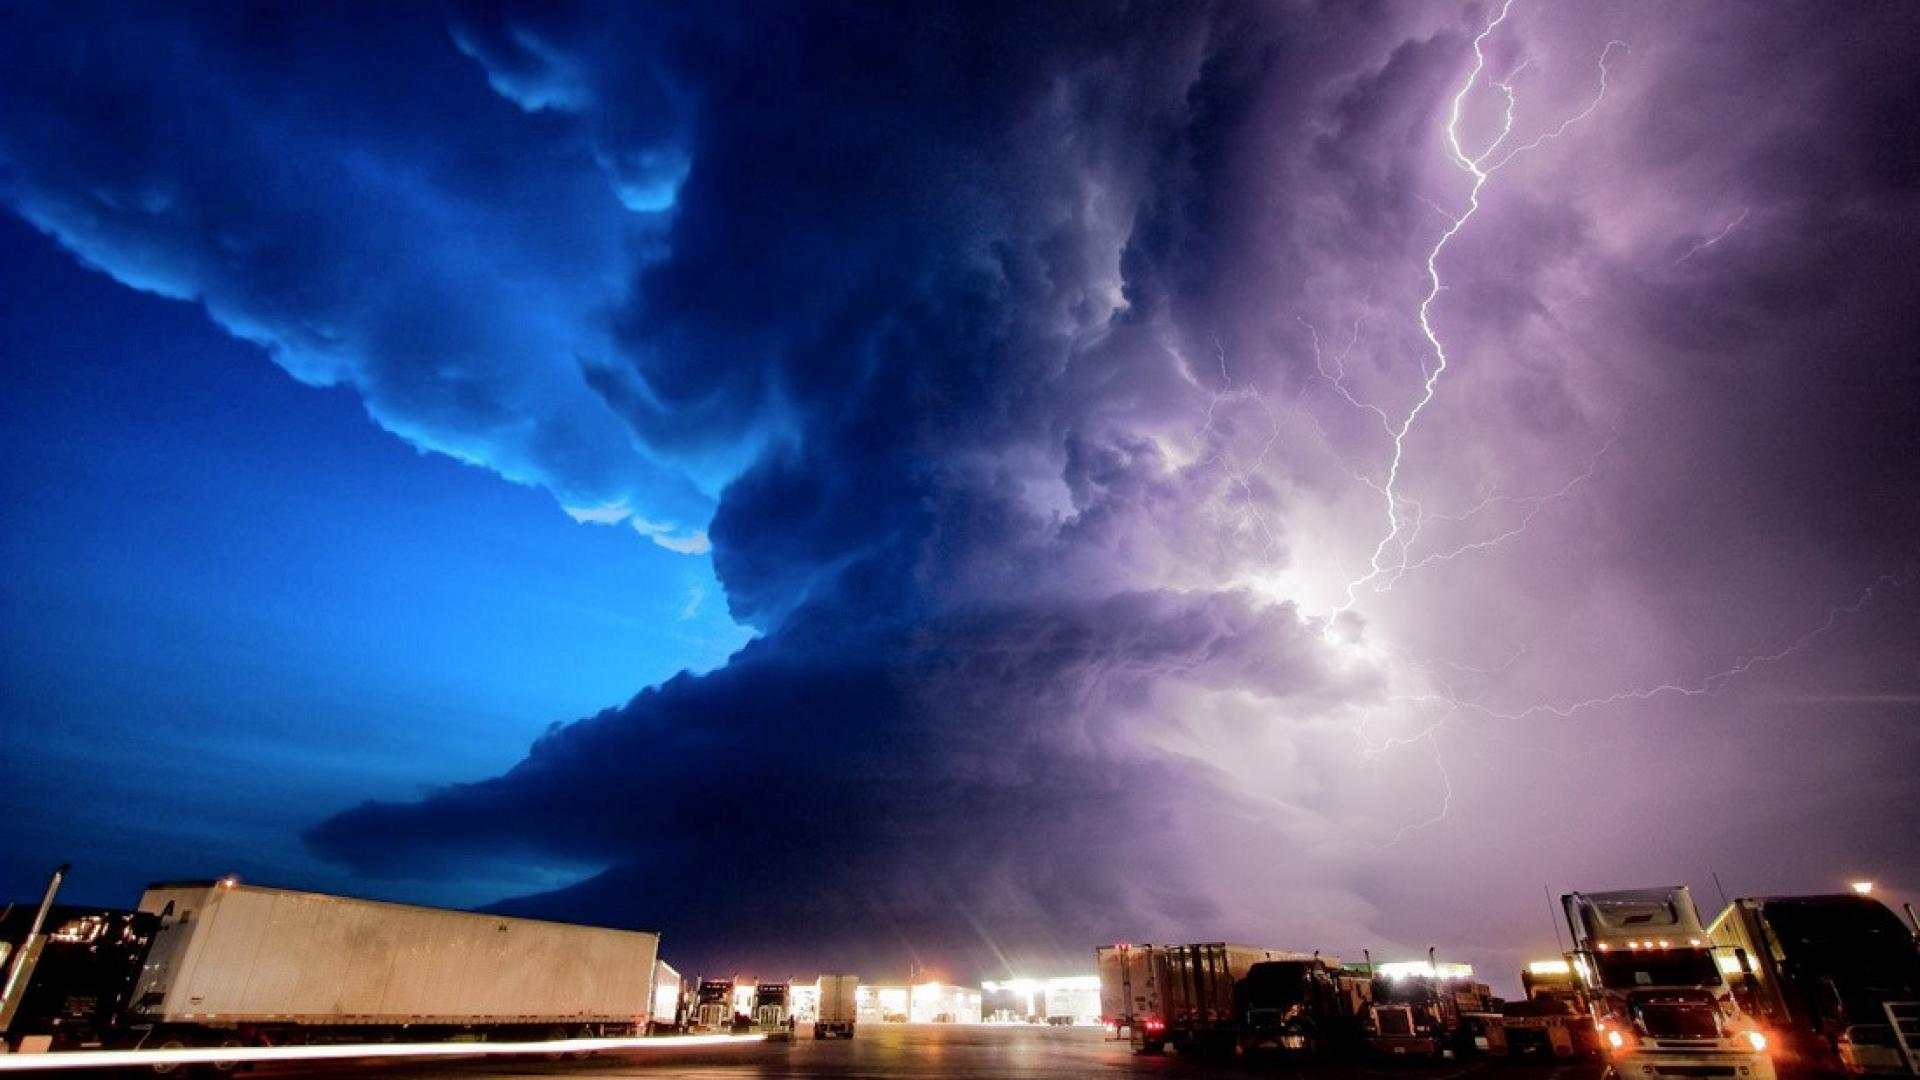 Supercell lightning mike storm wallpaper 84857 1920x1080